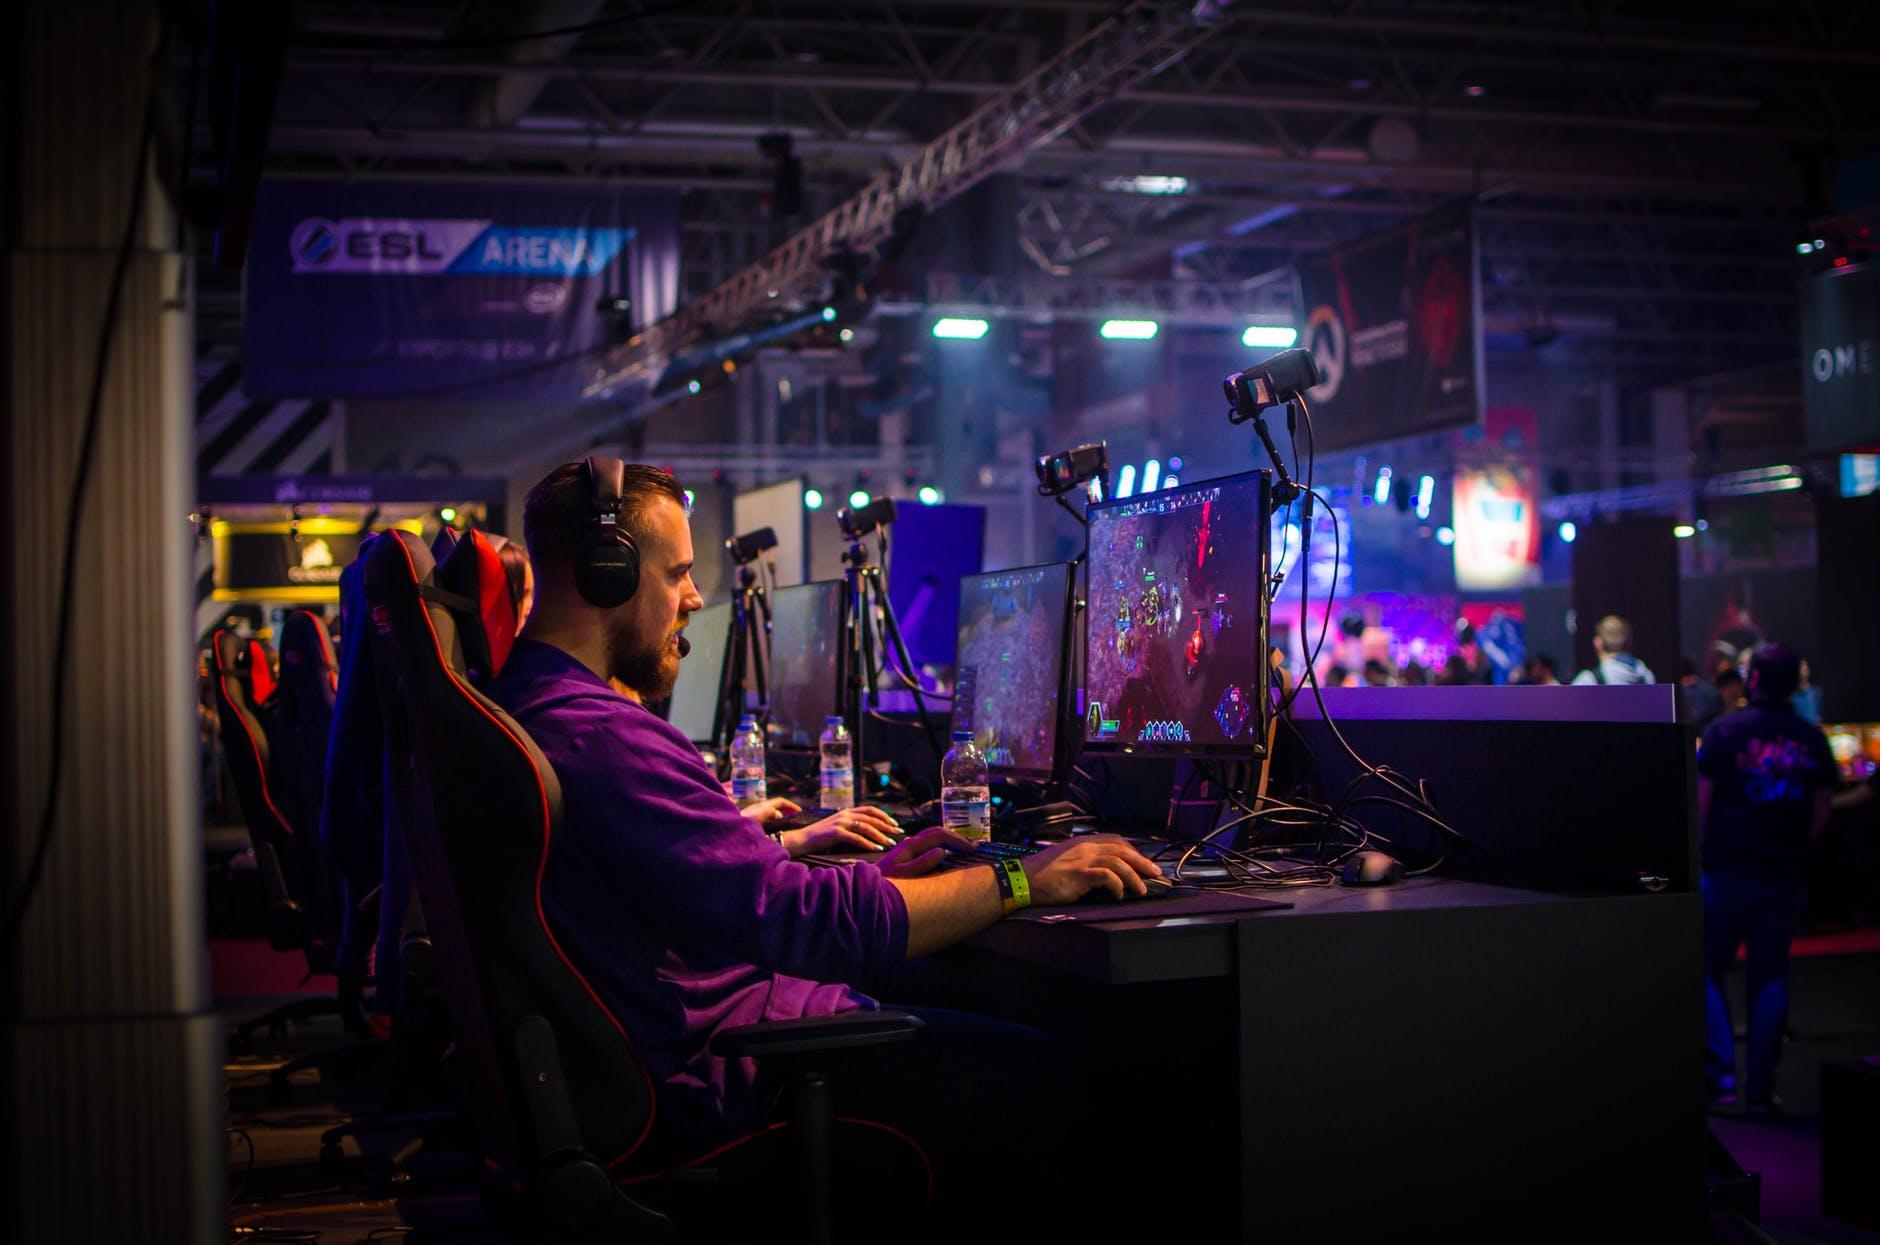 Infographic: Growing Esports Craze